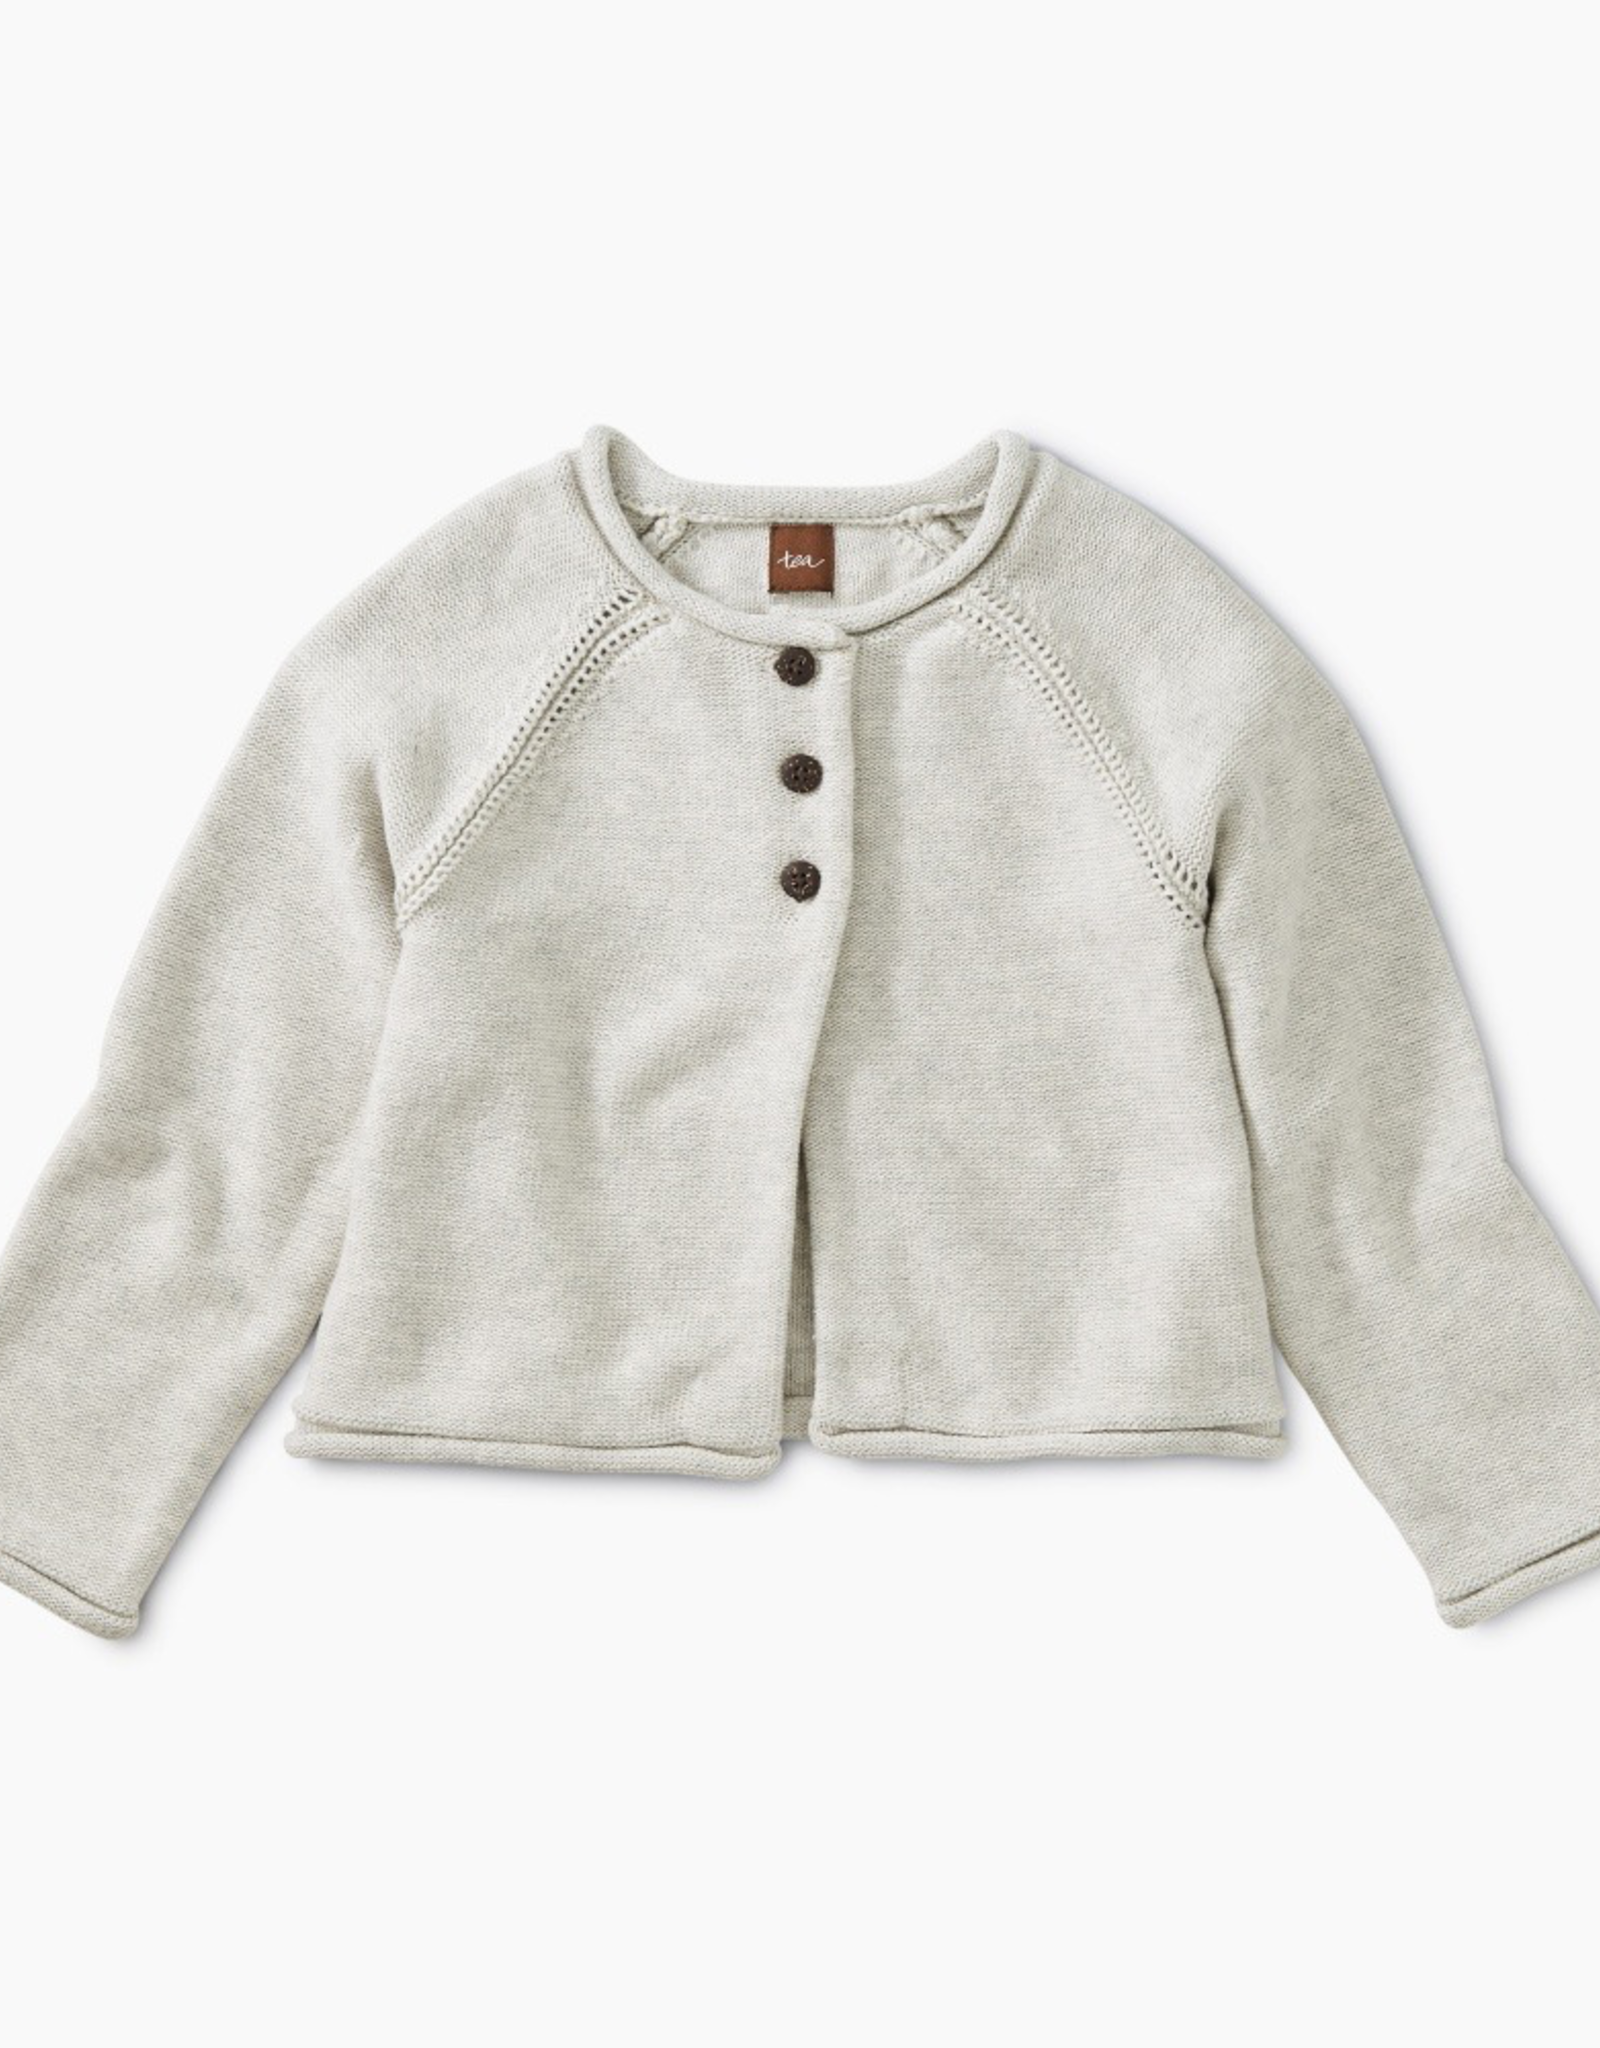 Tea Collection Solid Raglan Sweater Cardigan for Girl